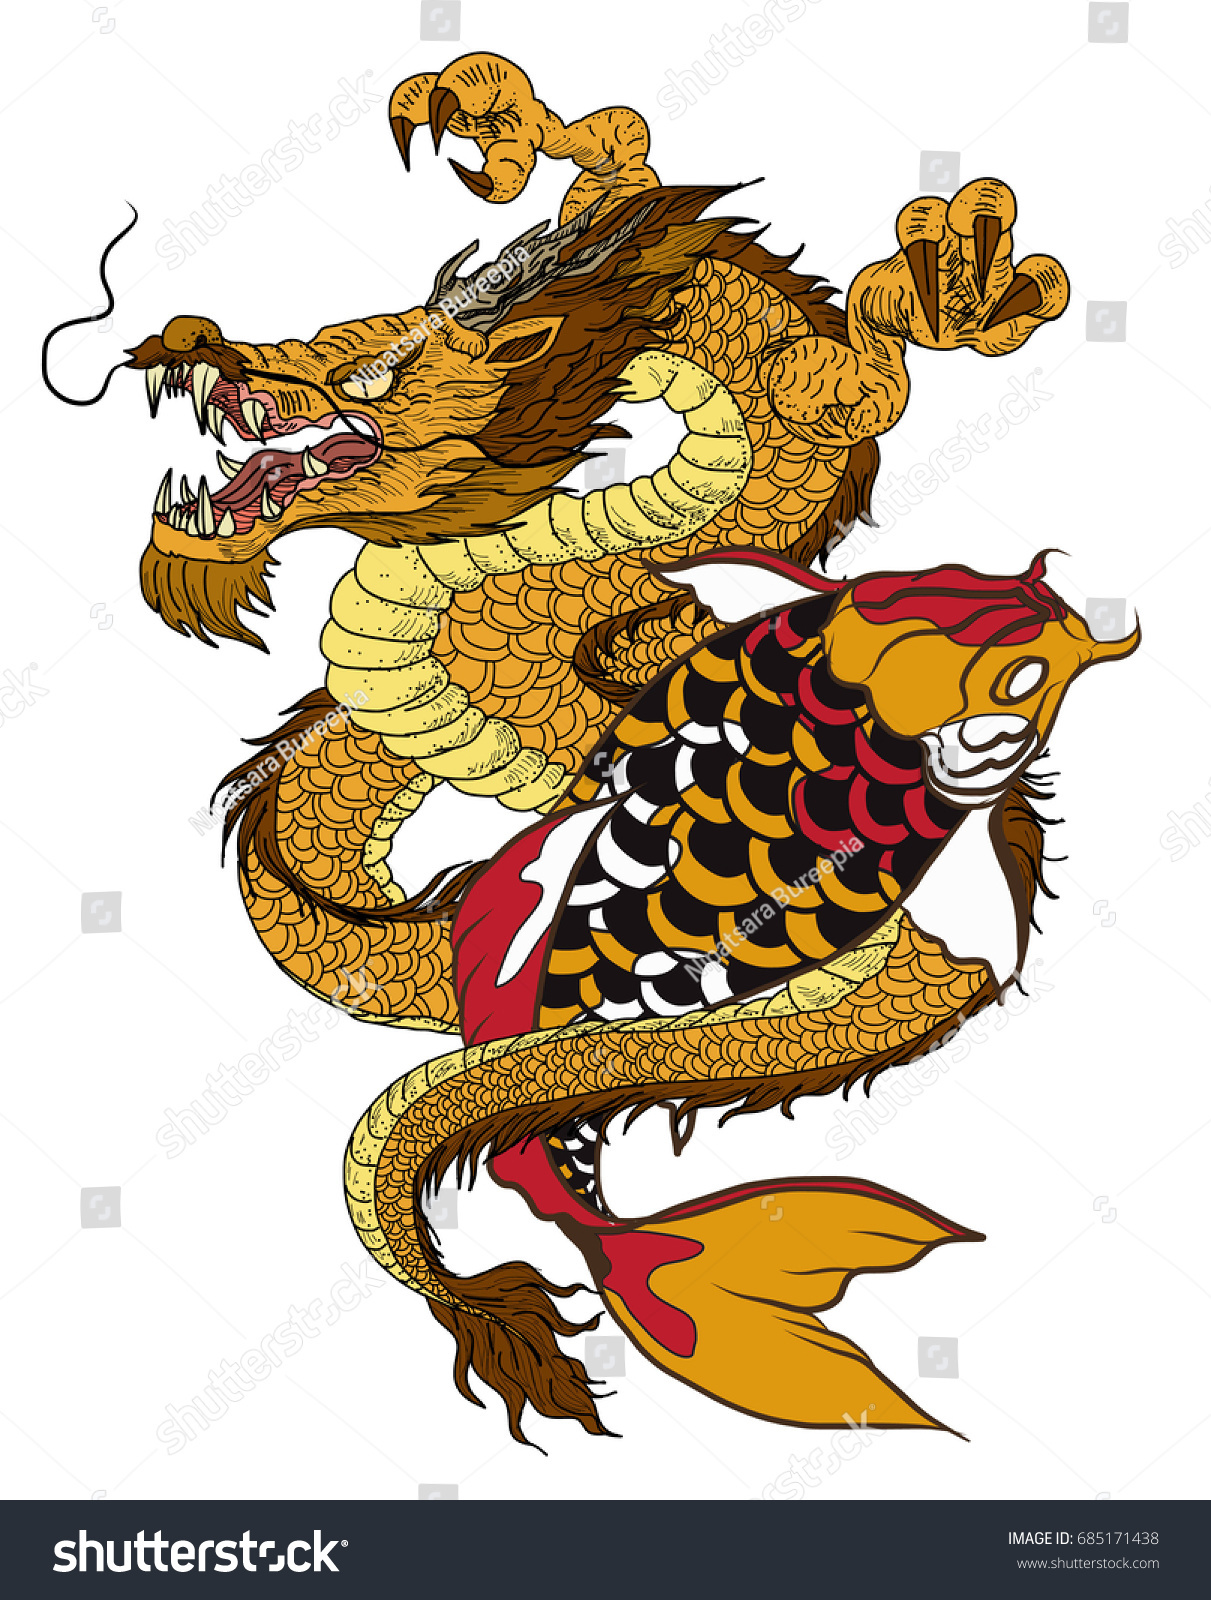 Hand drawn dragon koi fish flower stock vector 685171438 for Dragon koi fish